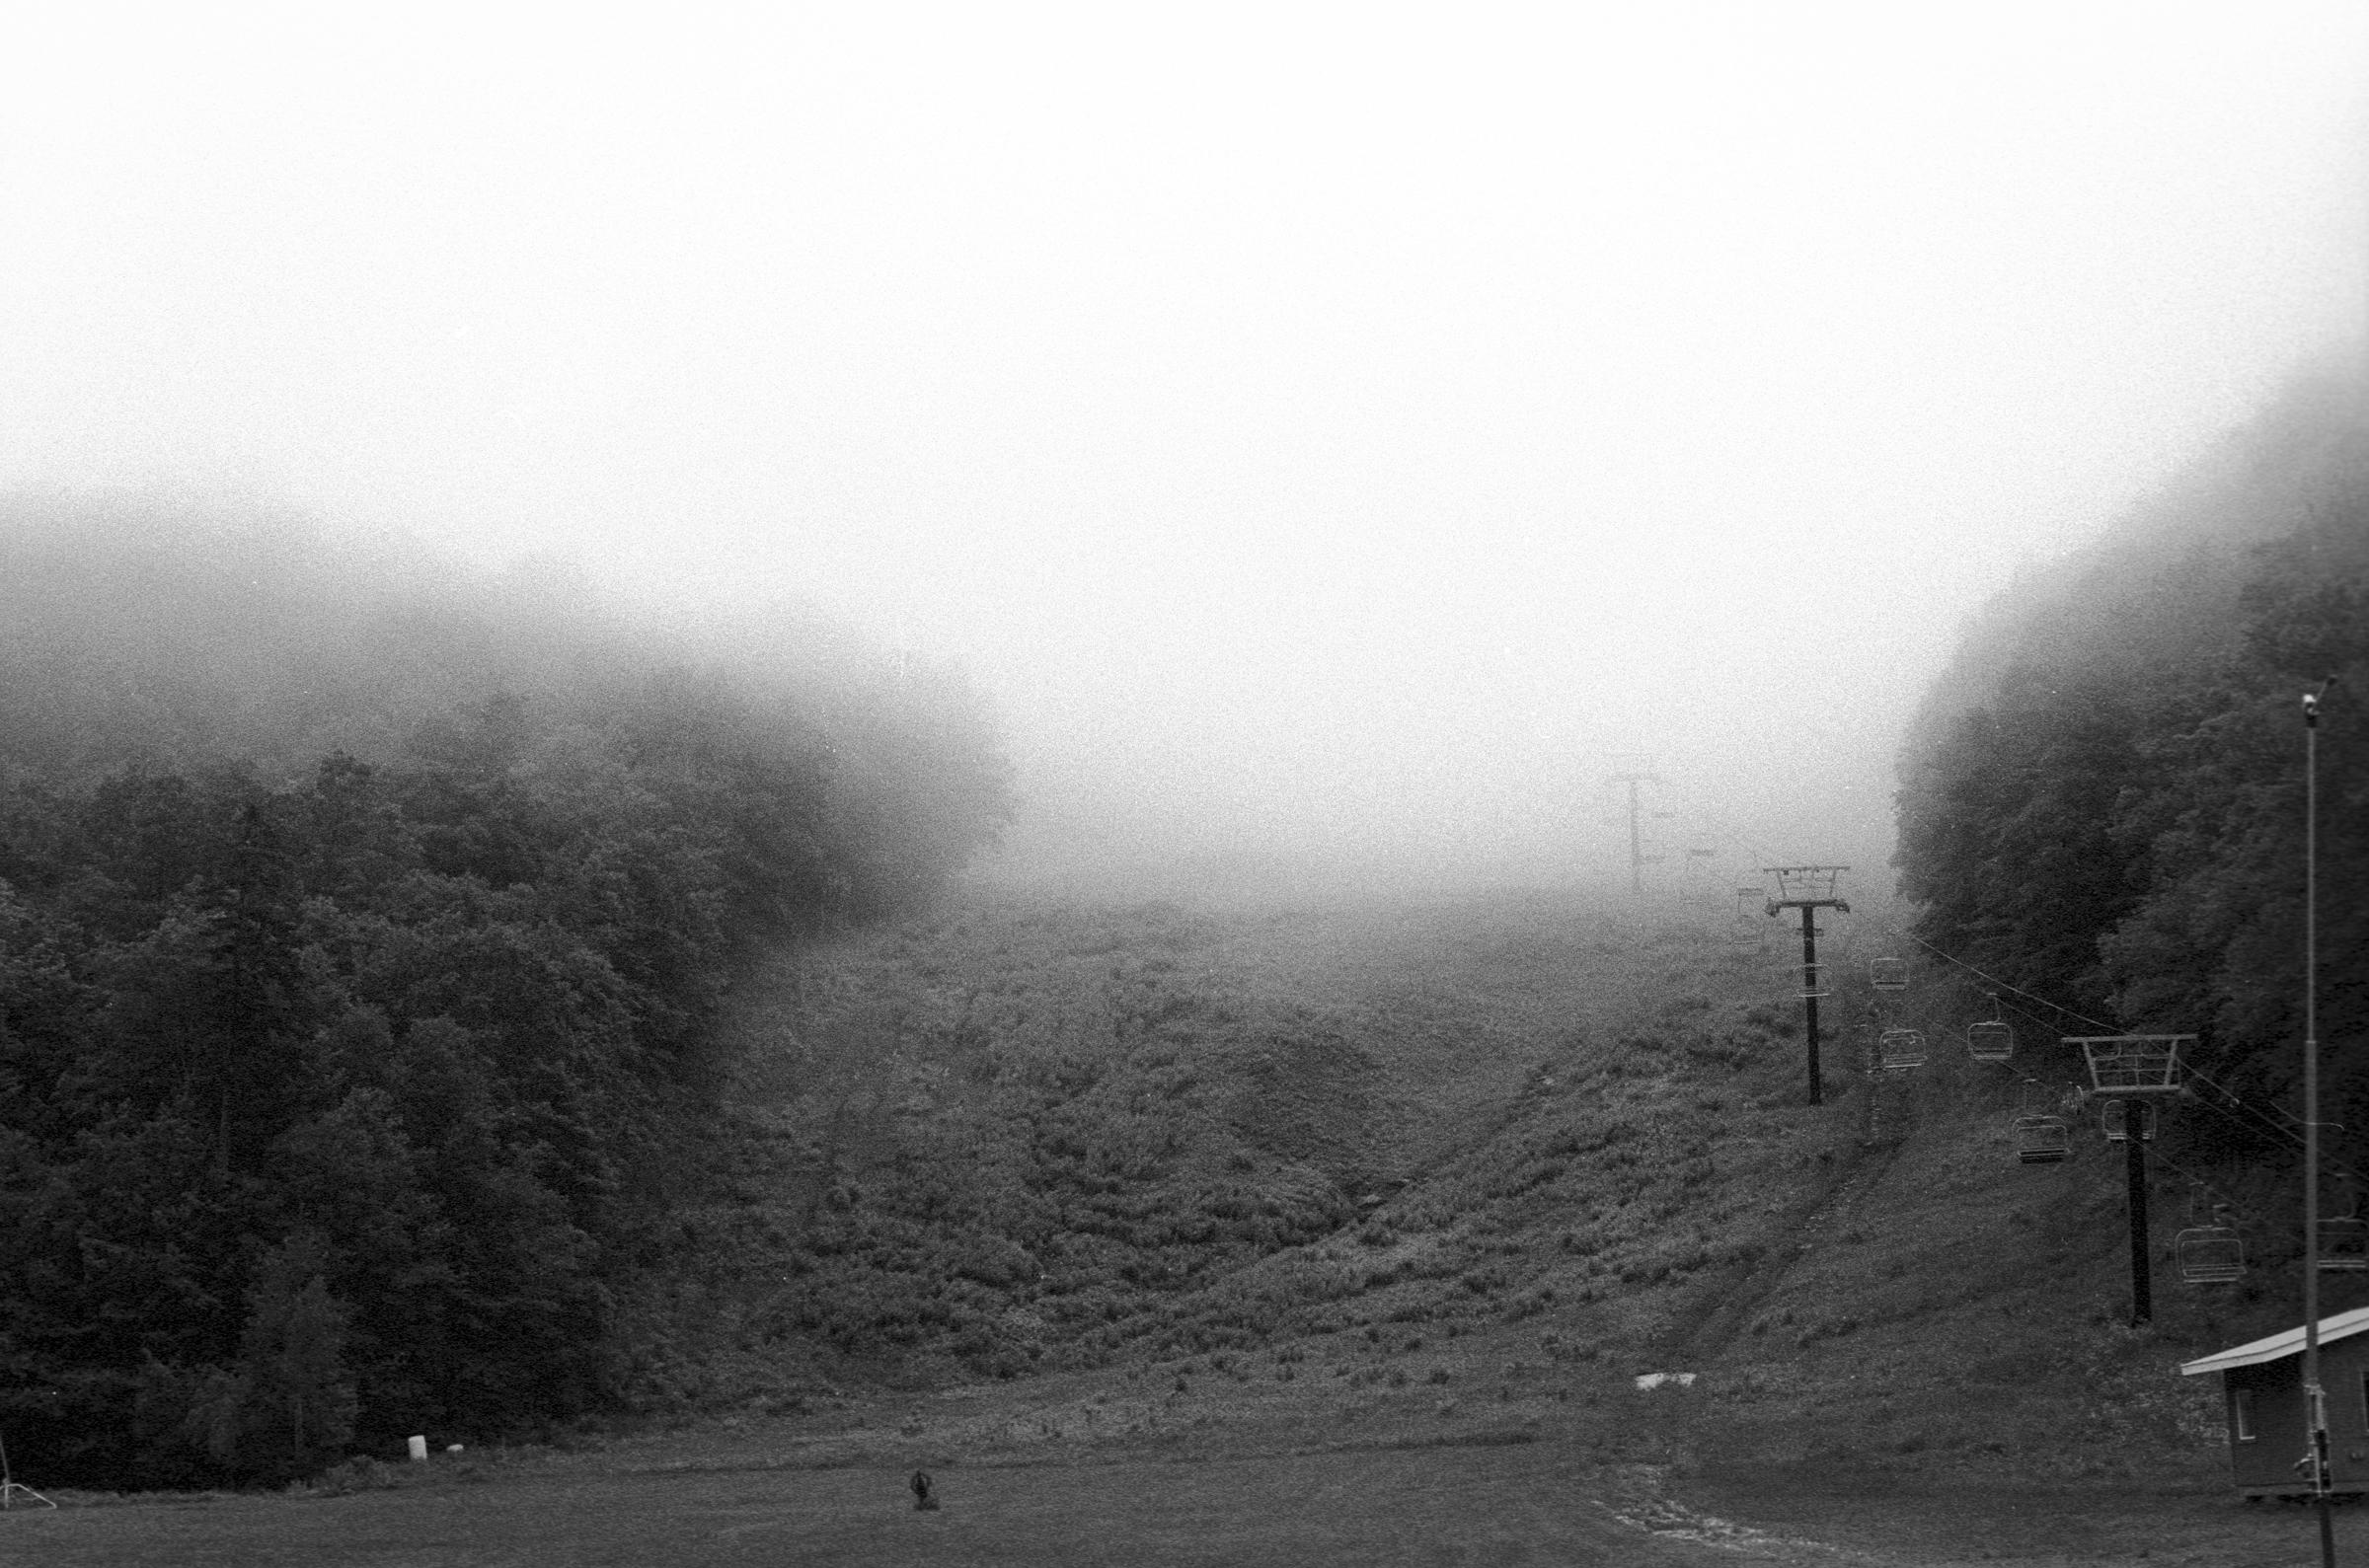 20150705-foghorizontal.jpg